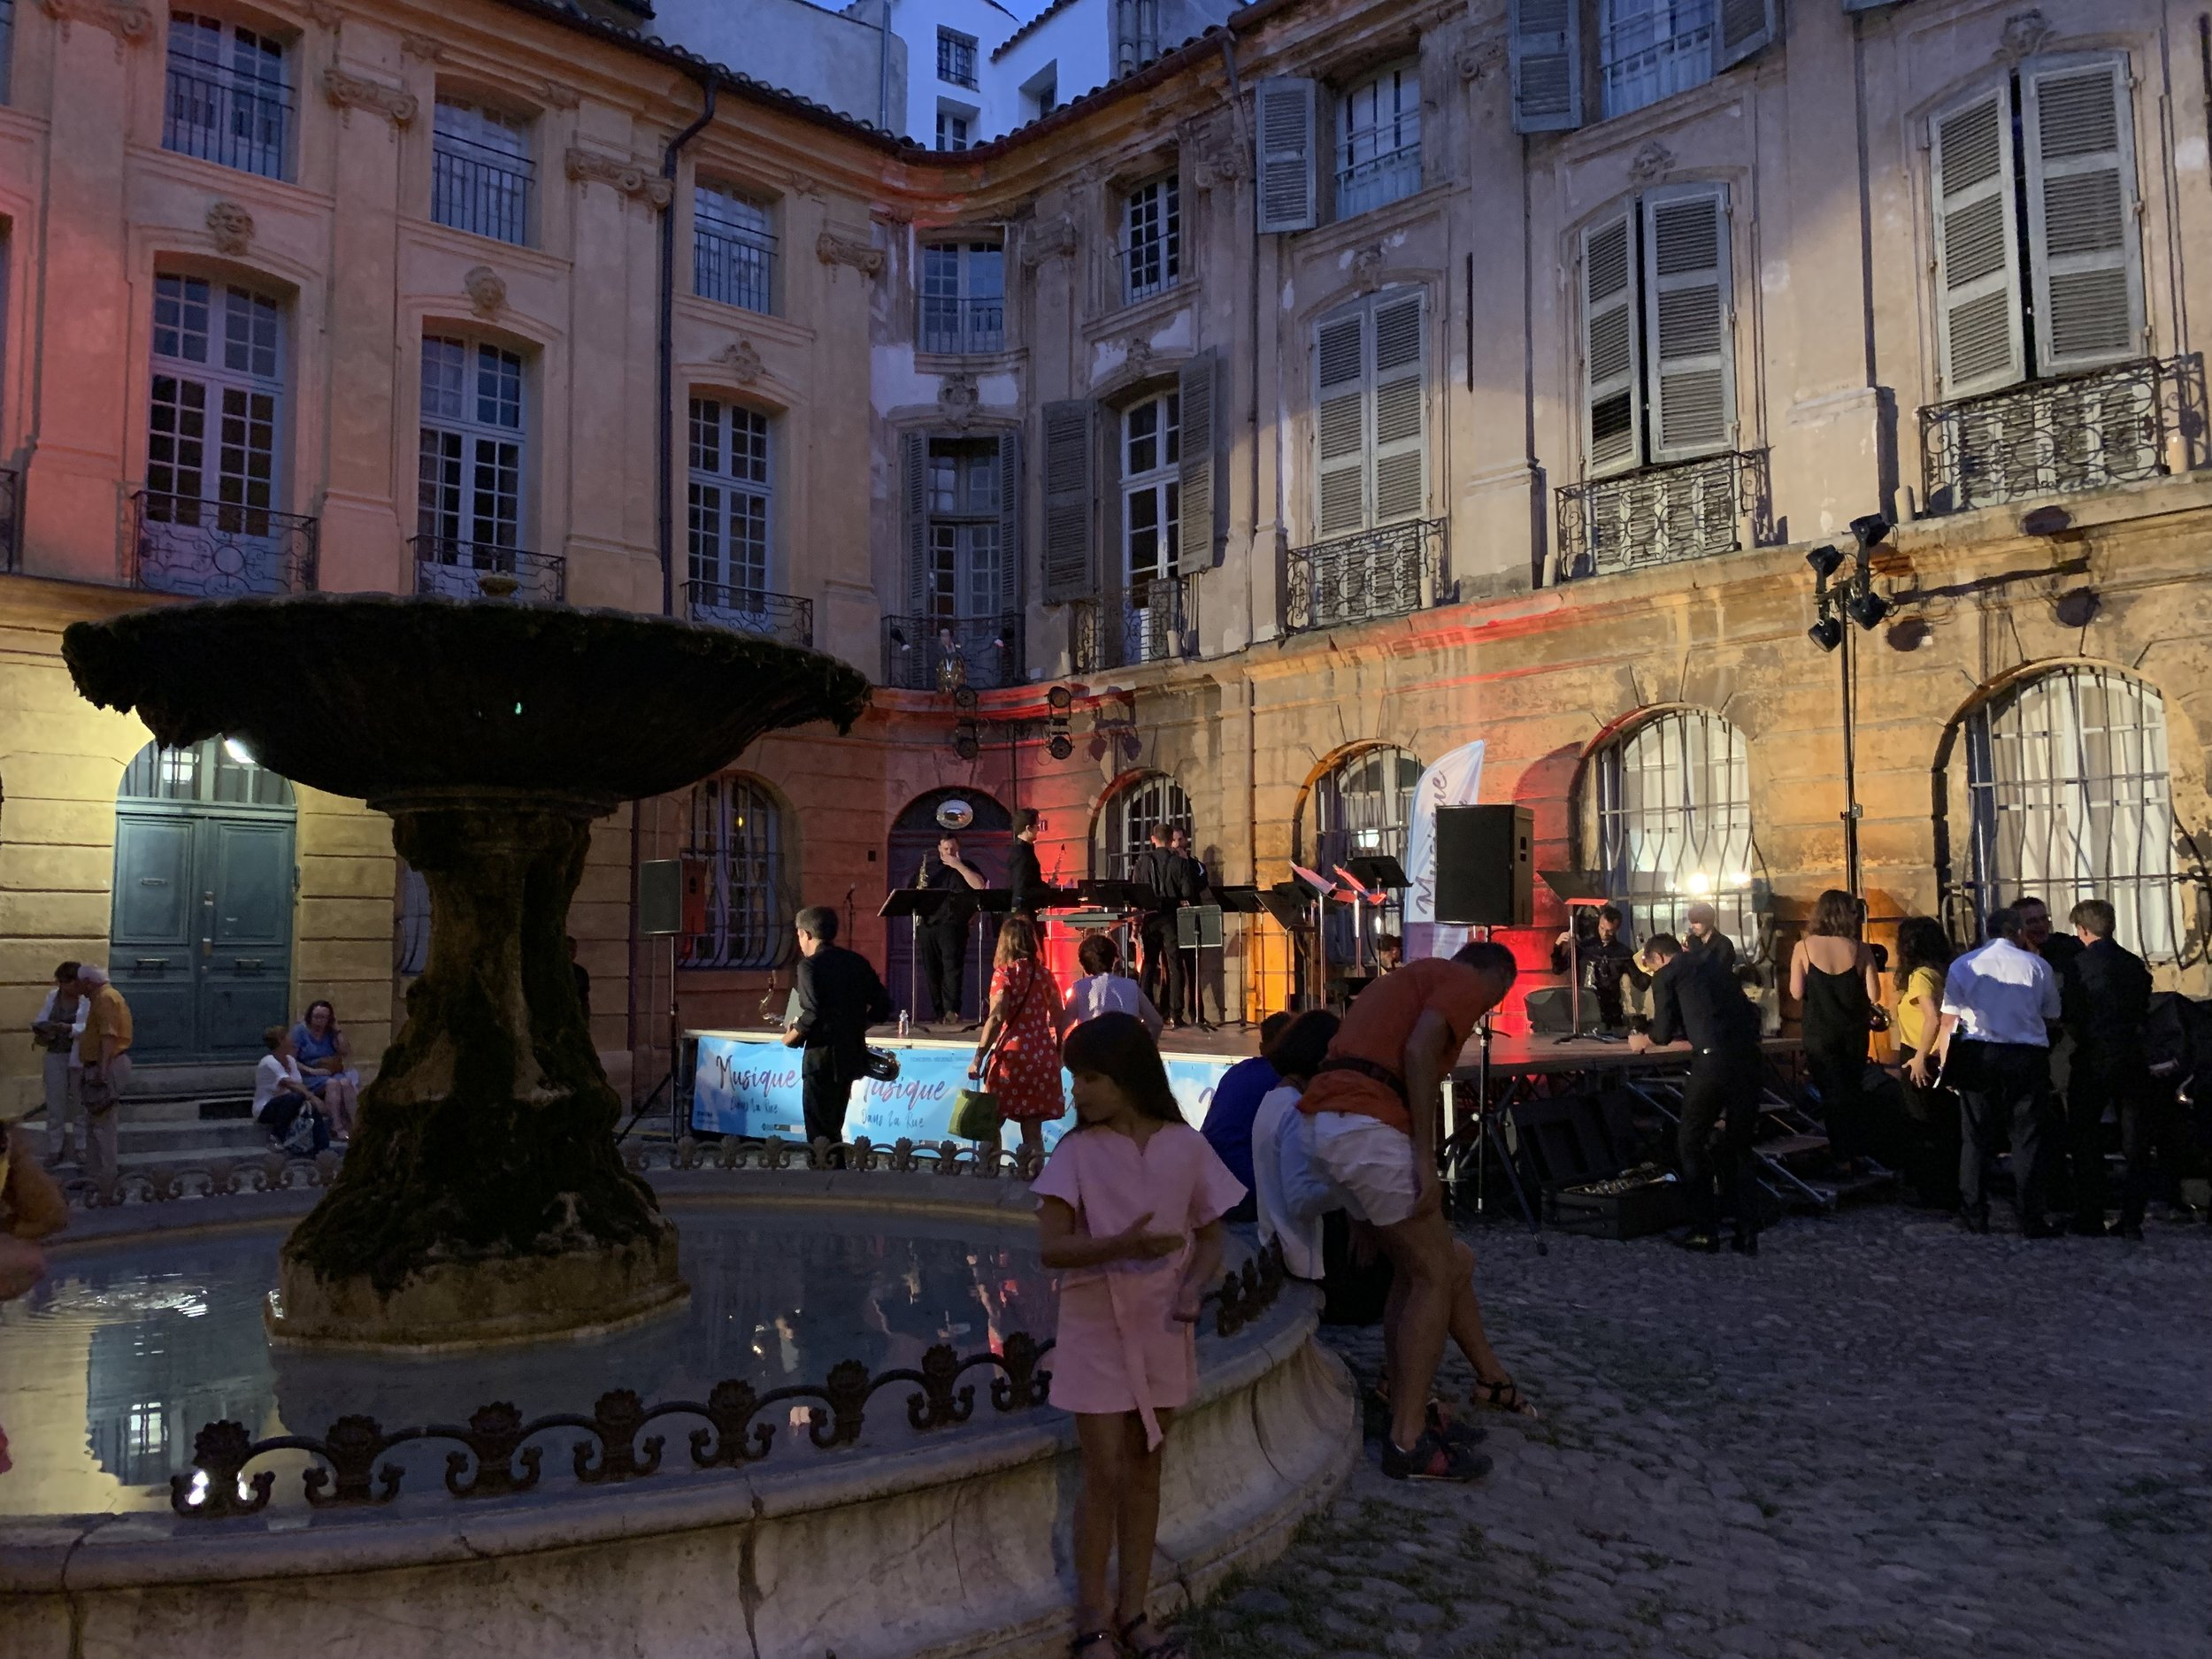 Aix-en-Provence-Old-Town-9.jpg